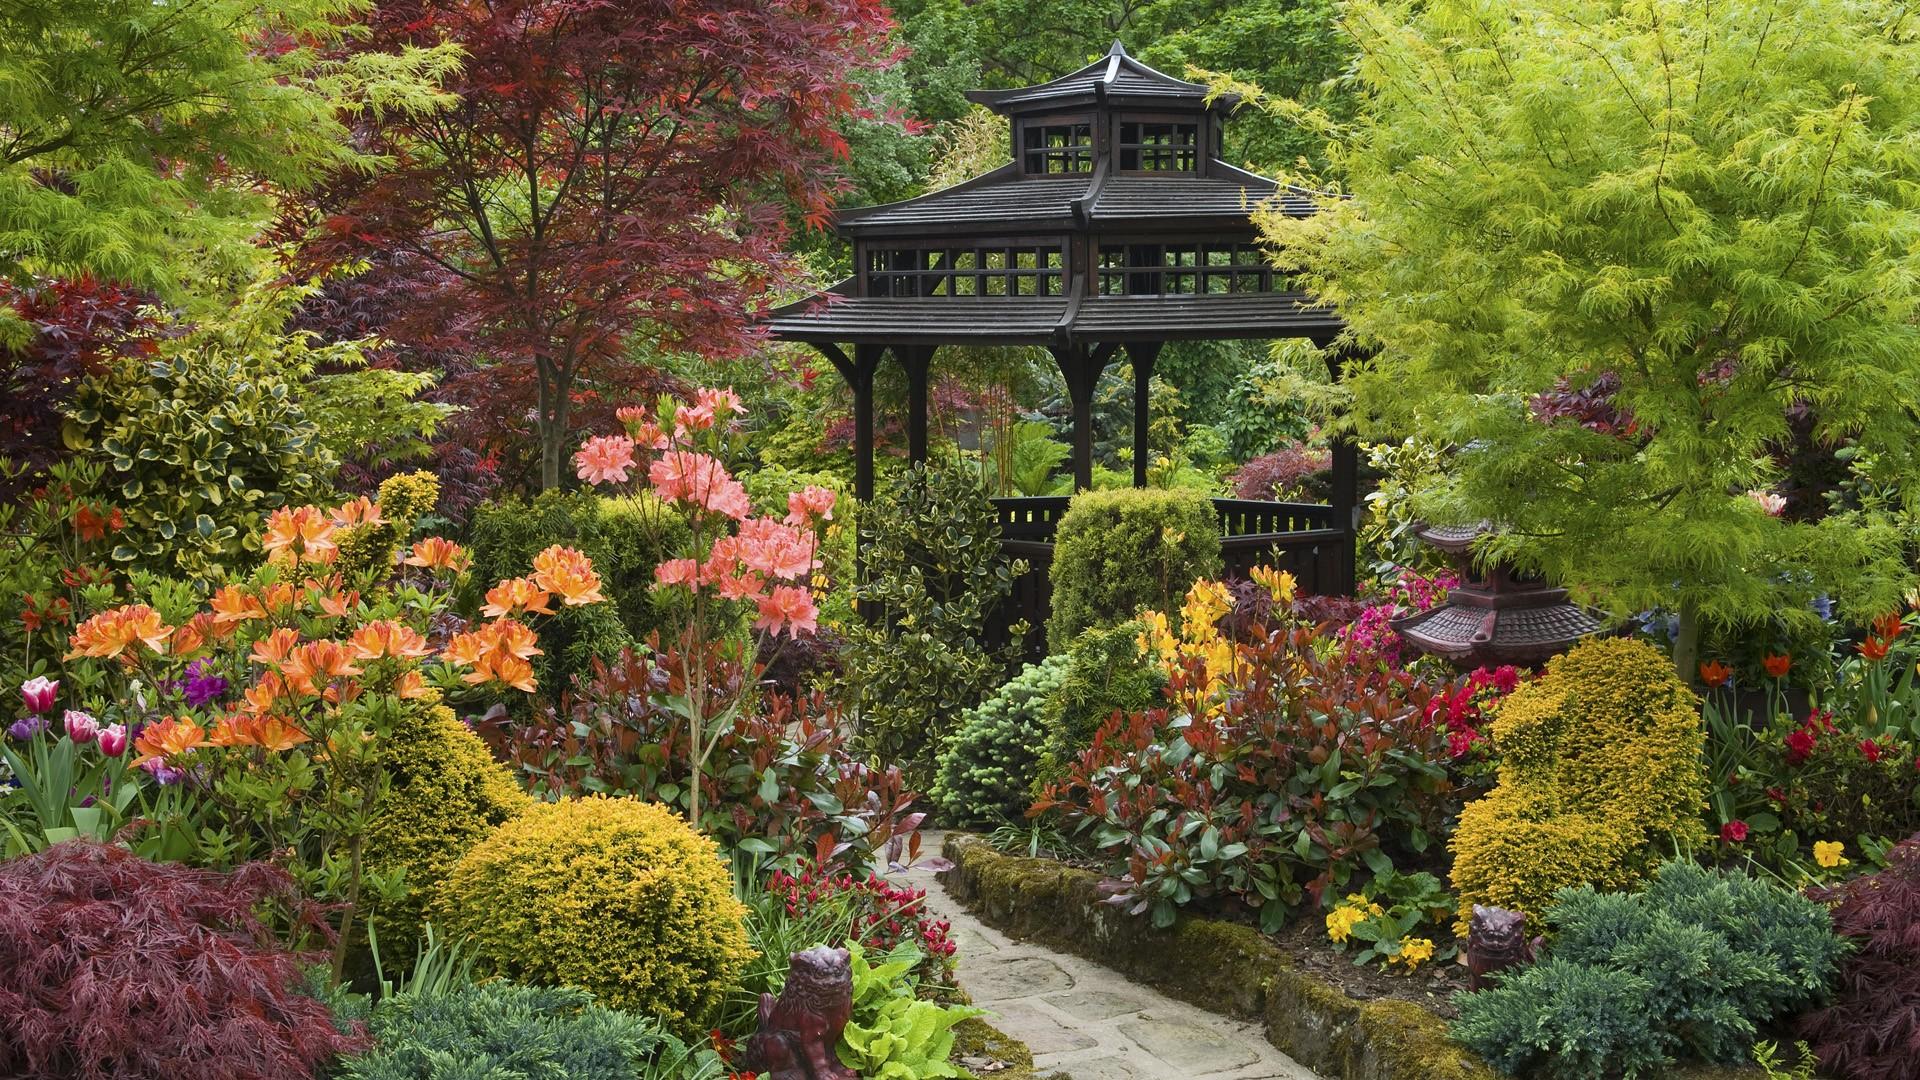 zen garden Find great deals on ebay for zen garden in home dcor items shop with confidence.